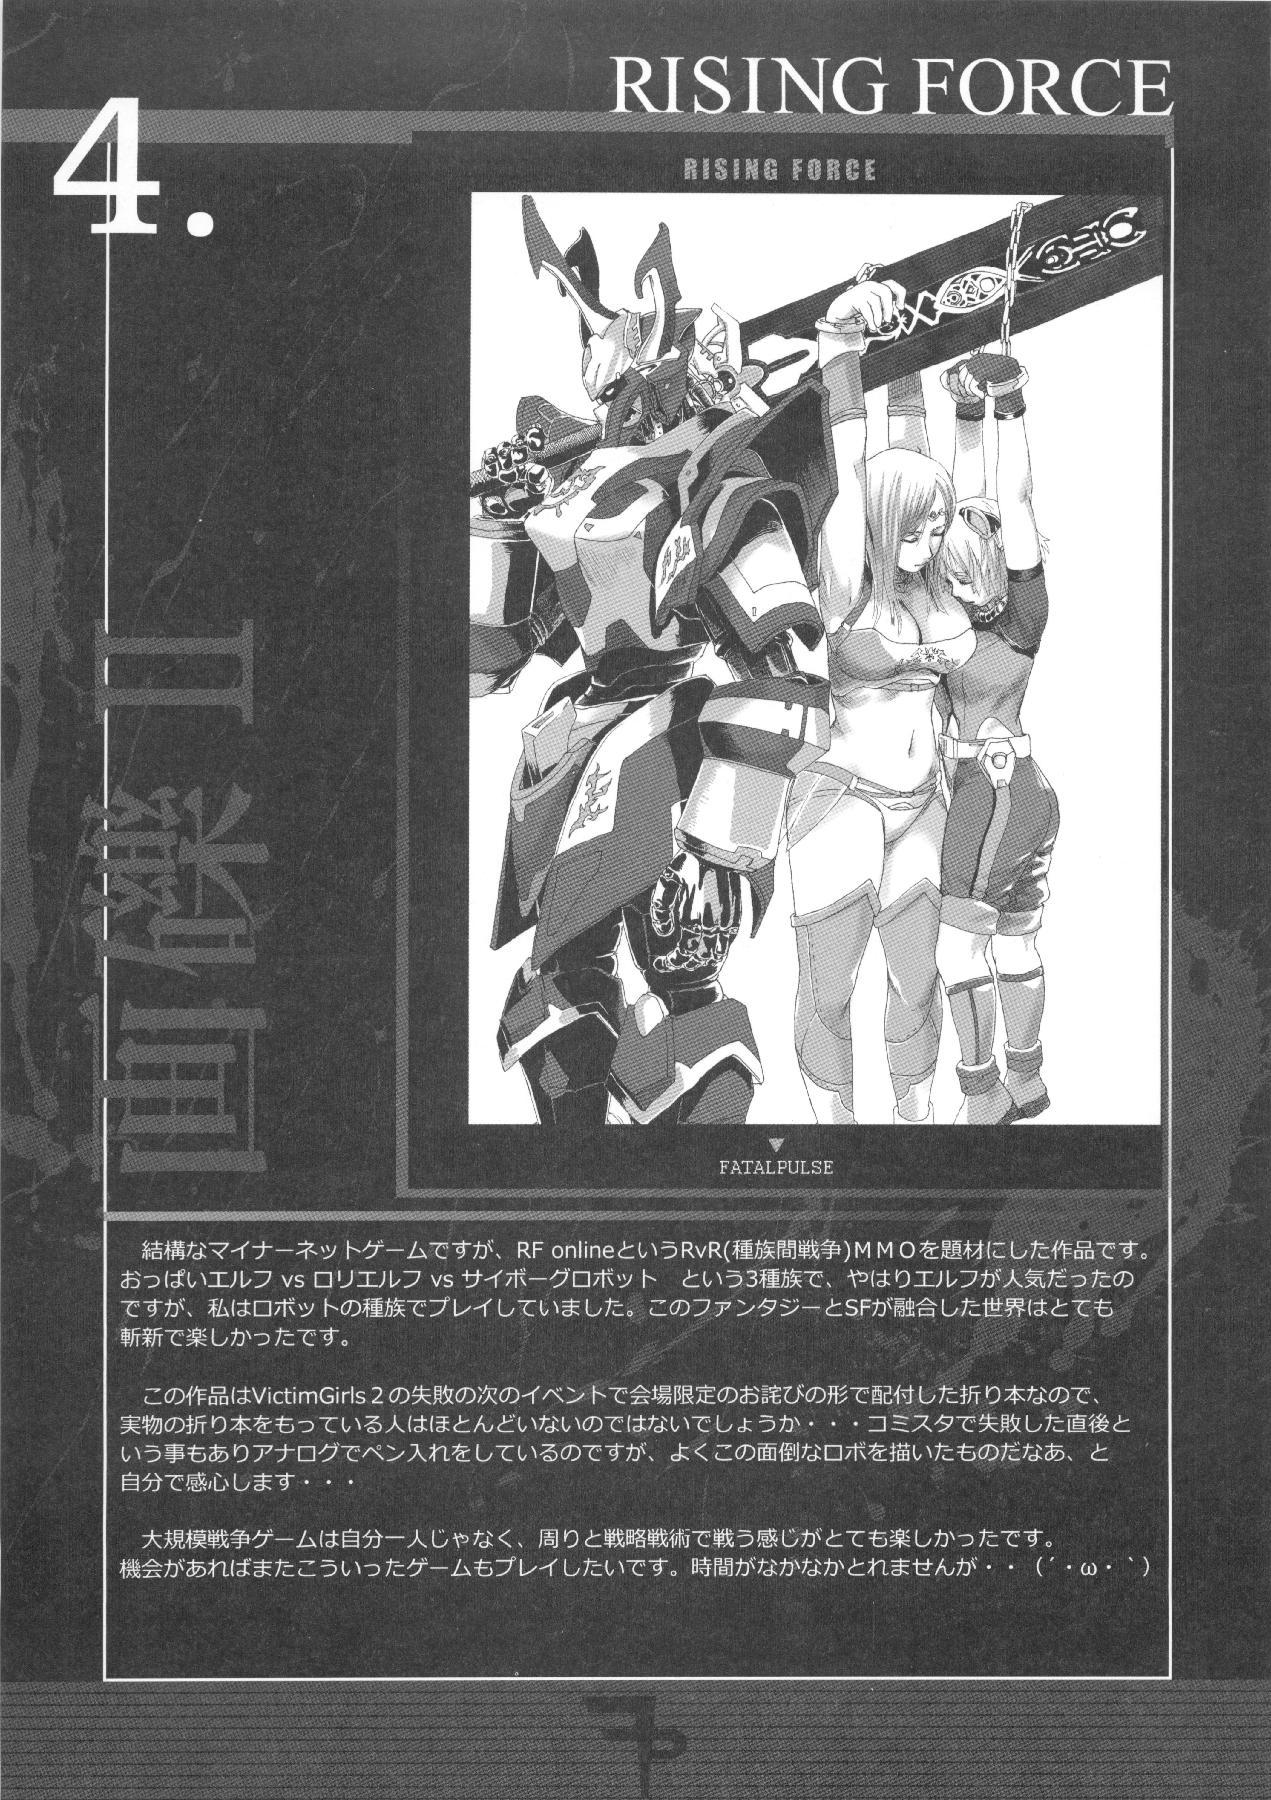 (C83) [Fatalpulse (Asanagi)] VictimGirls Compiled Vol.1 -Victimgirls Soushuuhen 1- MMO Game Selection (Various) 101